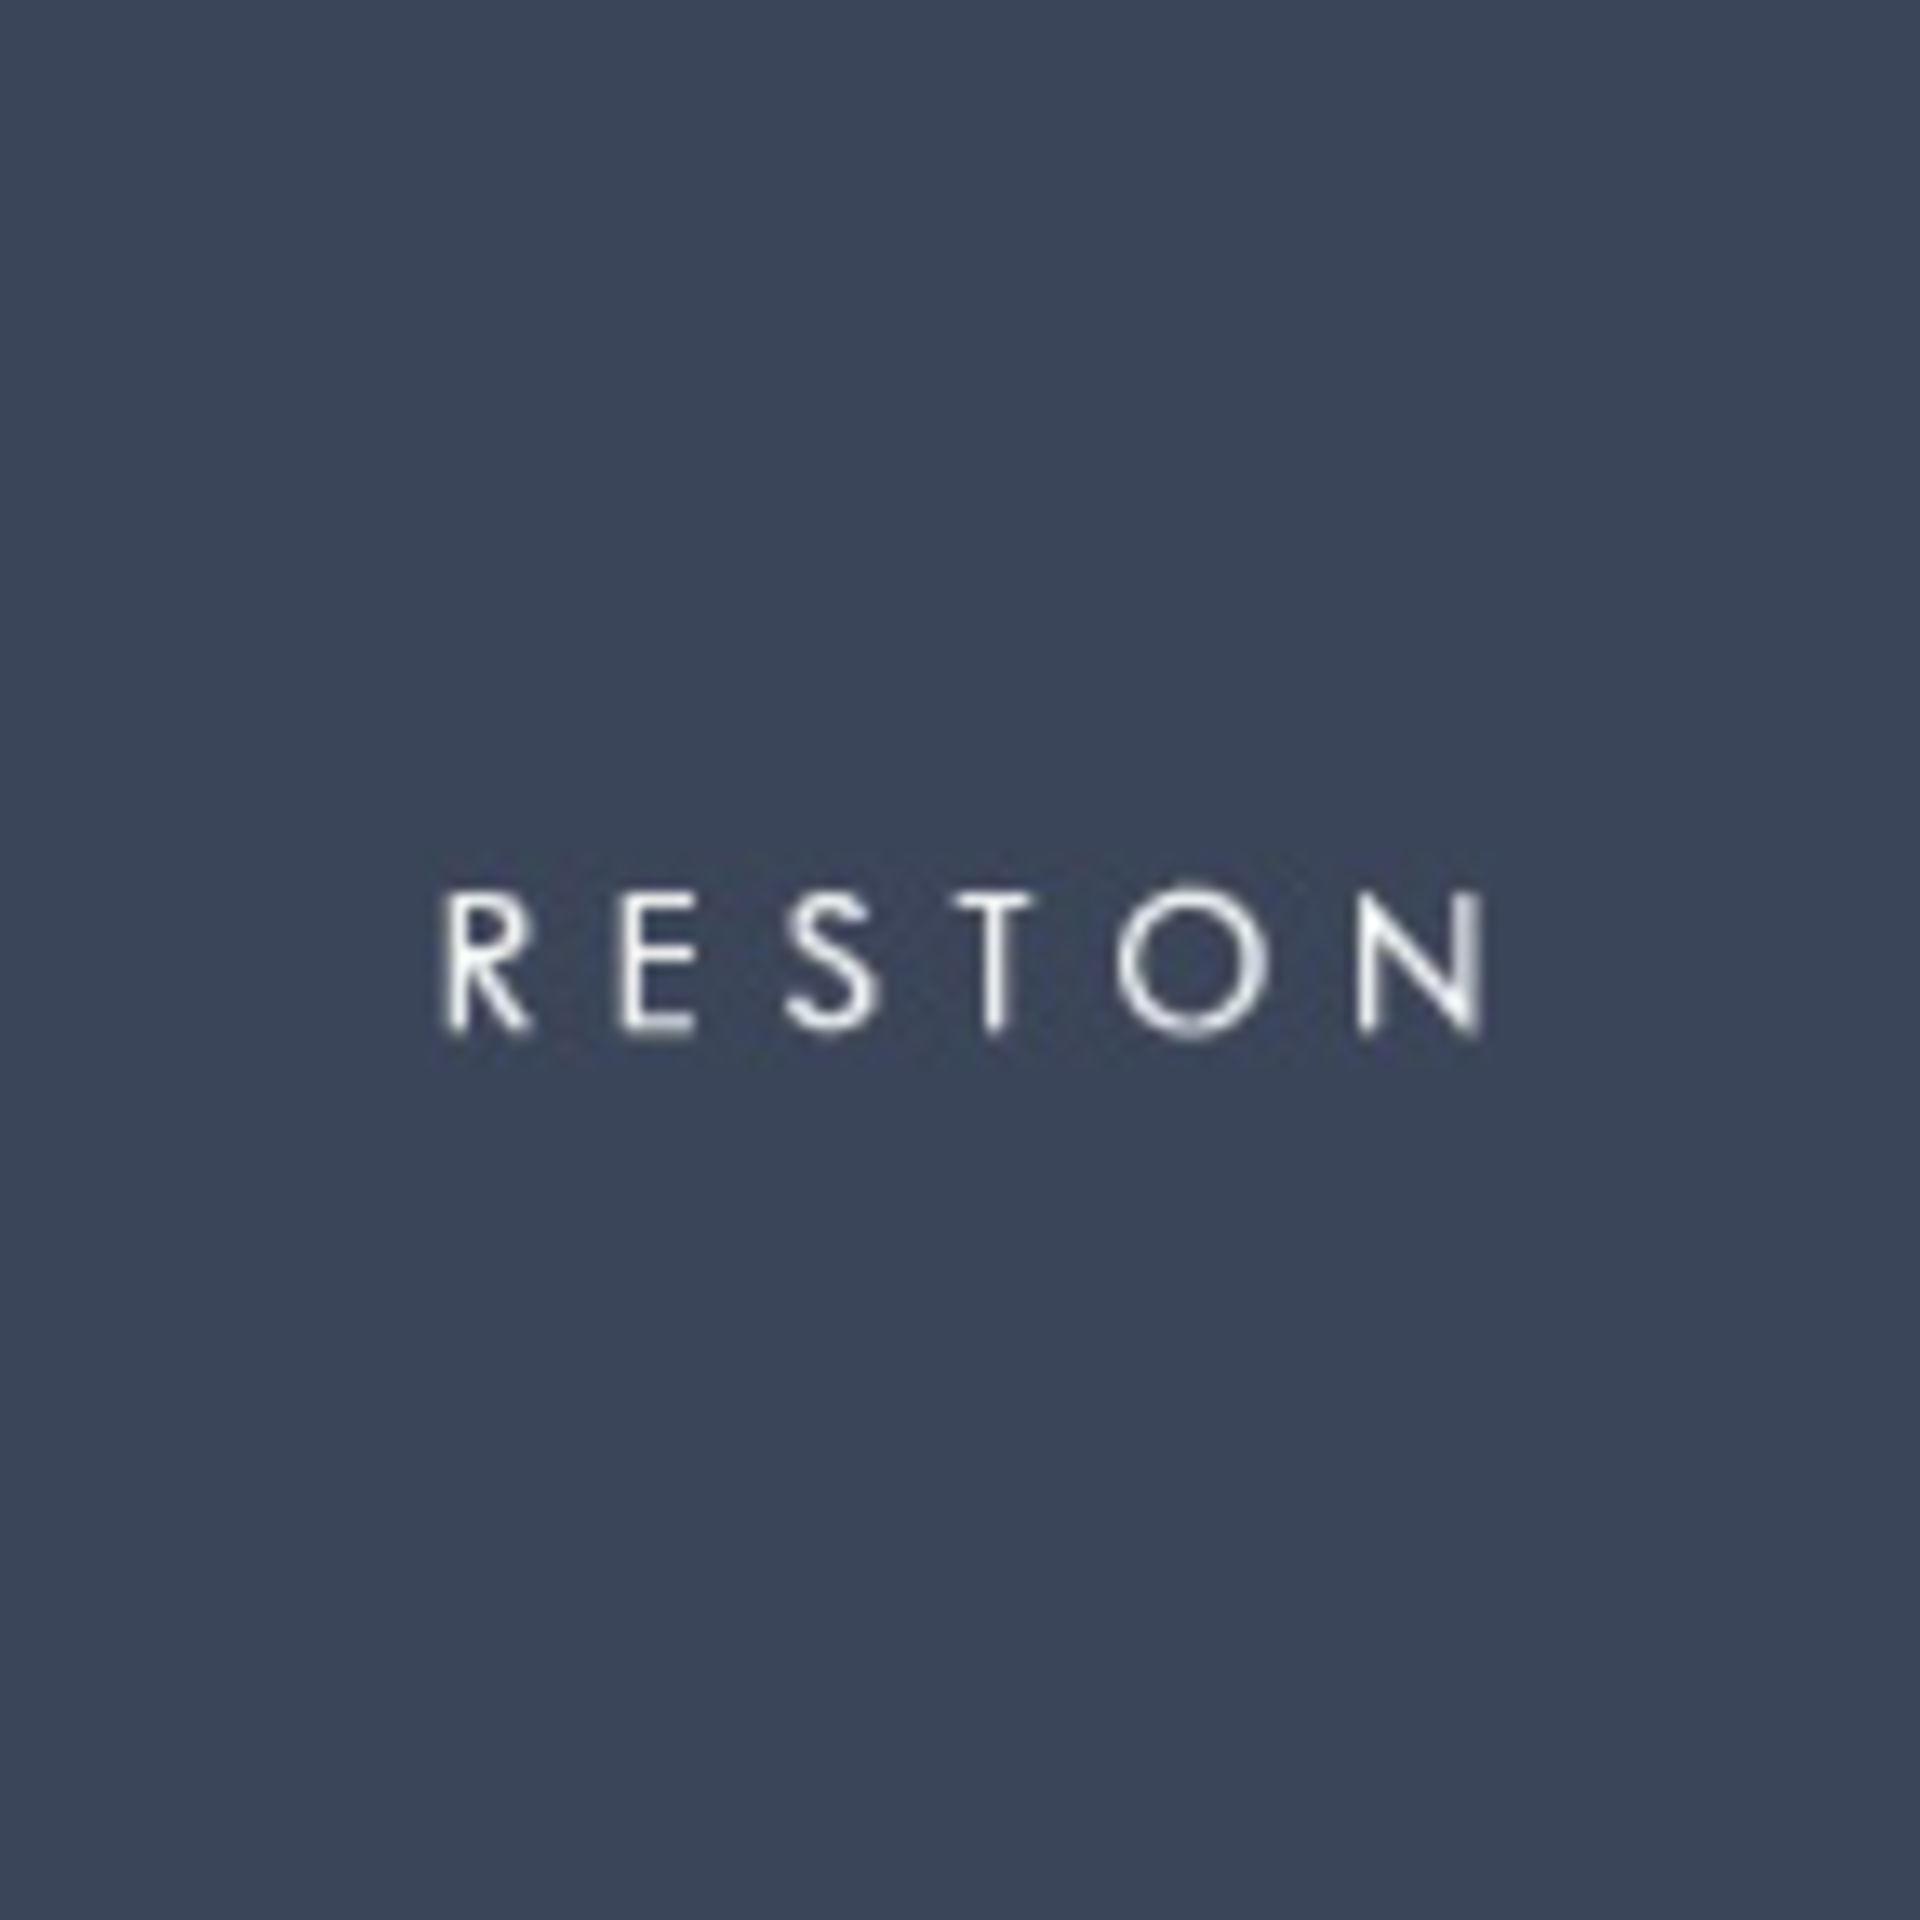 Reston